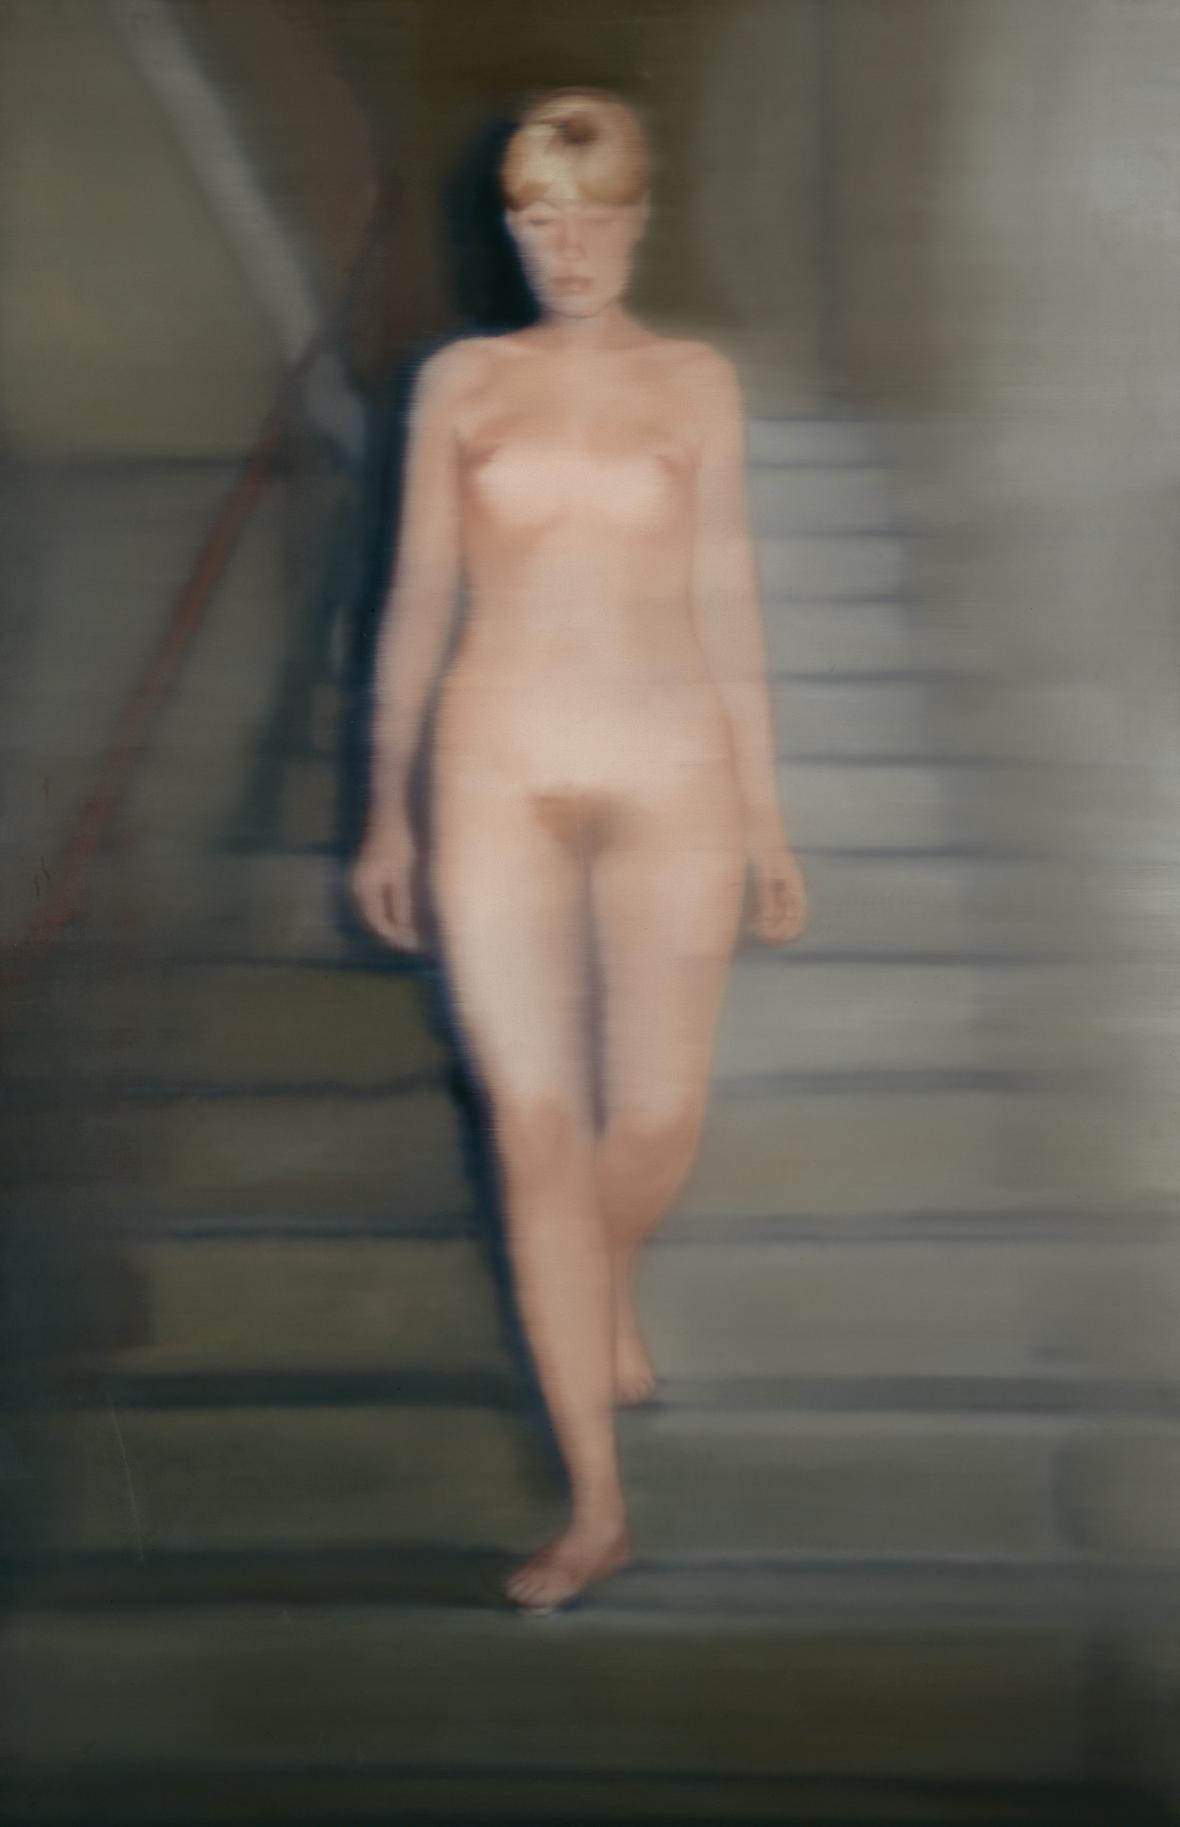 Gerhard Richter / Ema (Akt na schodech), 1966